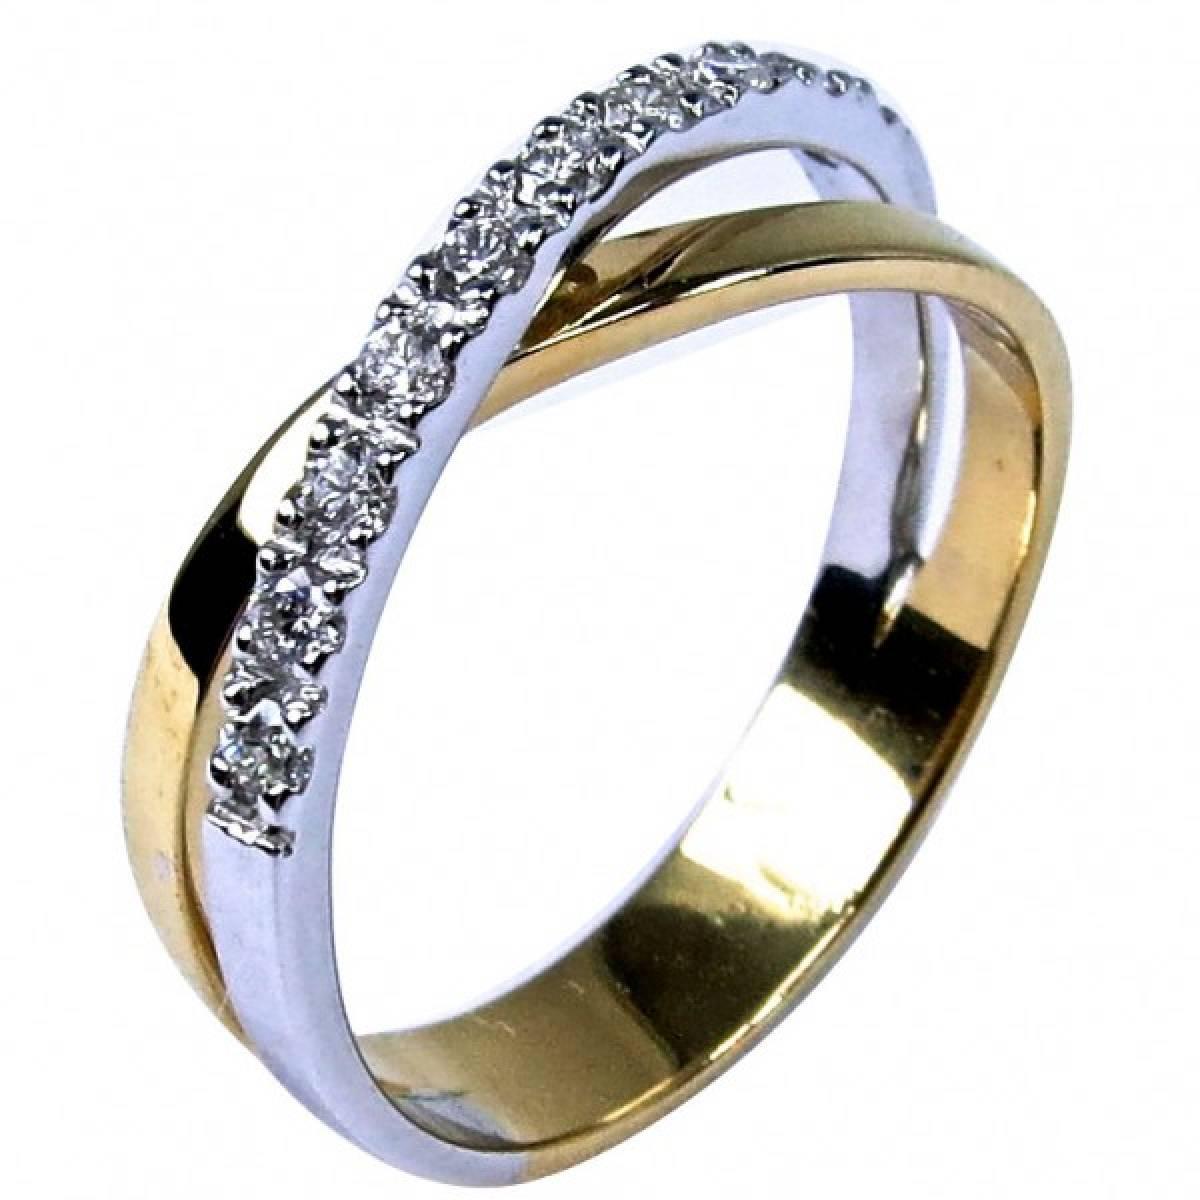 Anel de Noivado ouro bicolor de 9 e 19kts, com diamantes ou zircónias